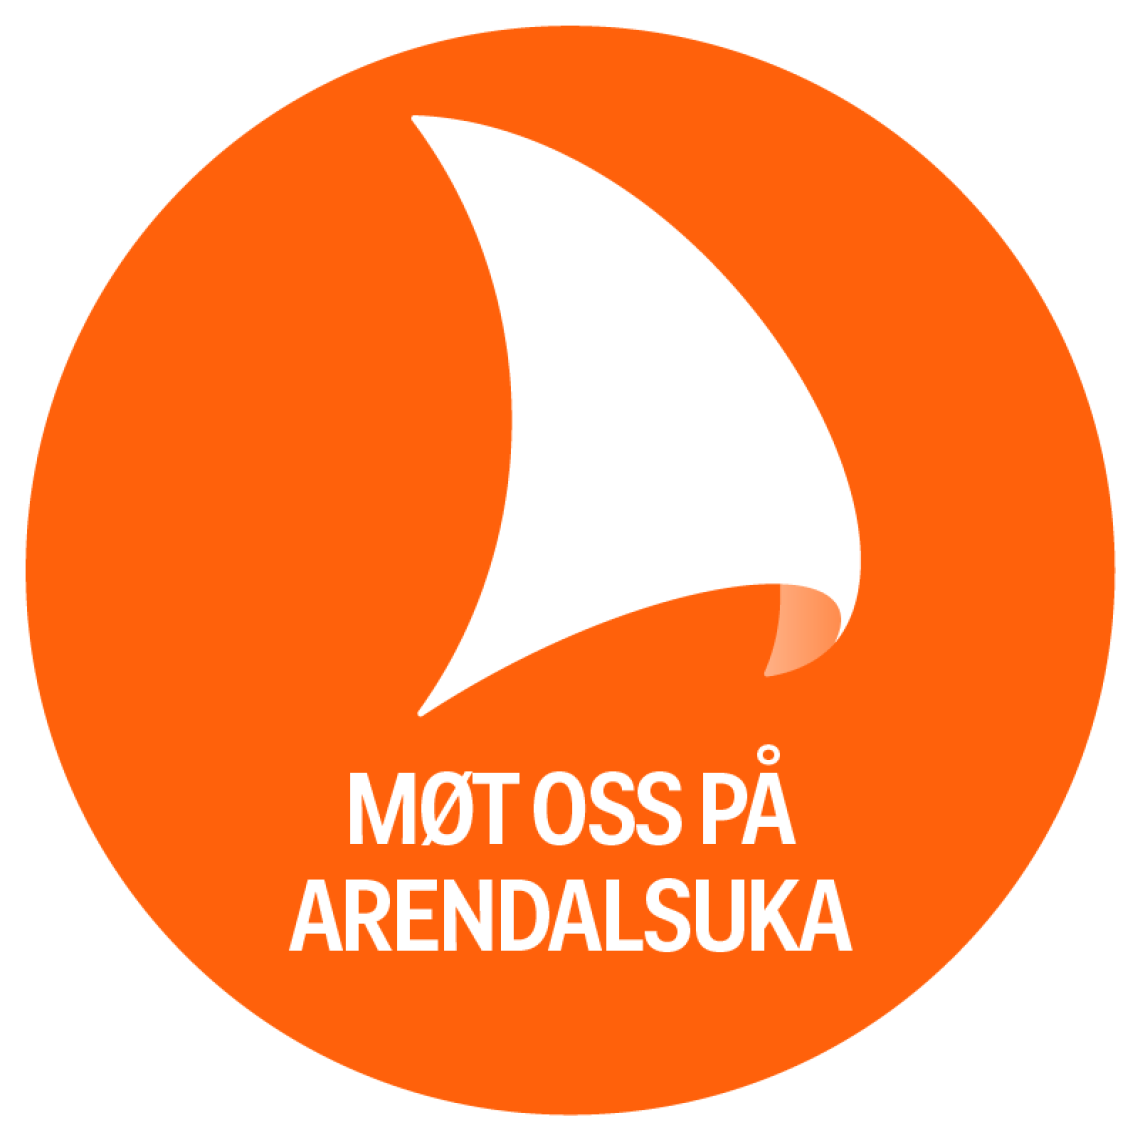 Senterpartiet på: ARENDALSUKA 2017